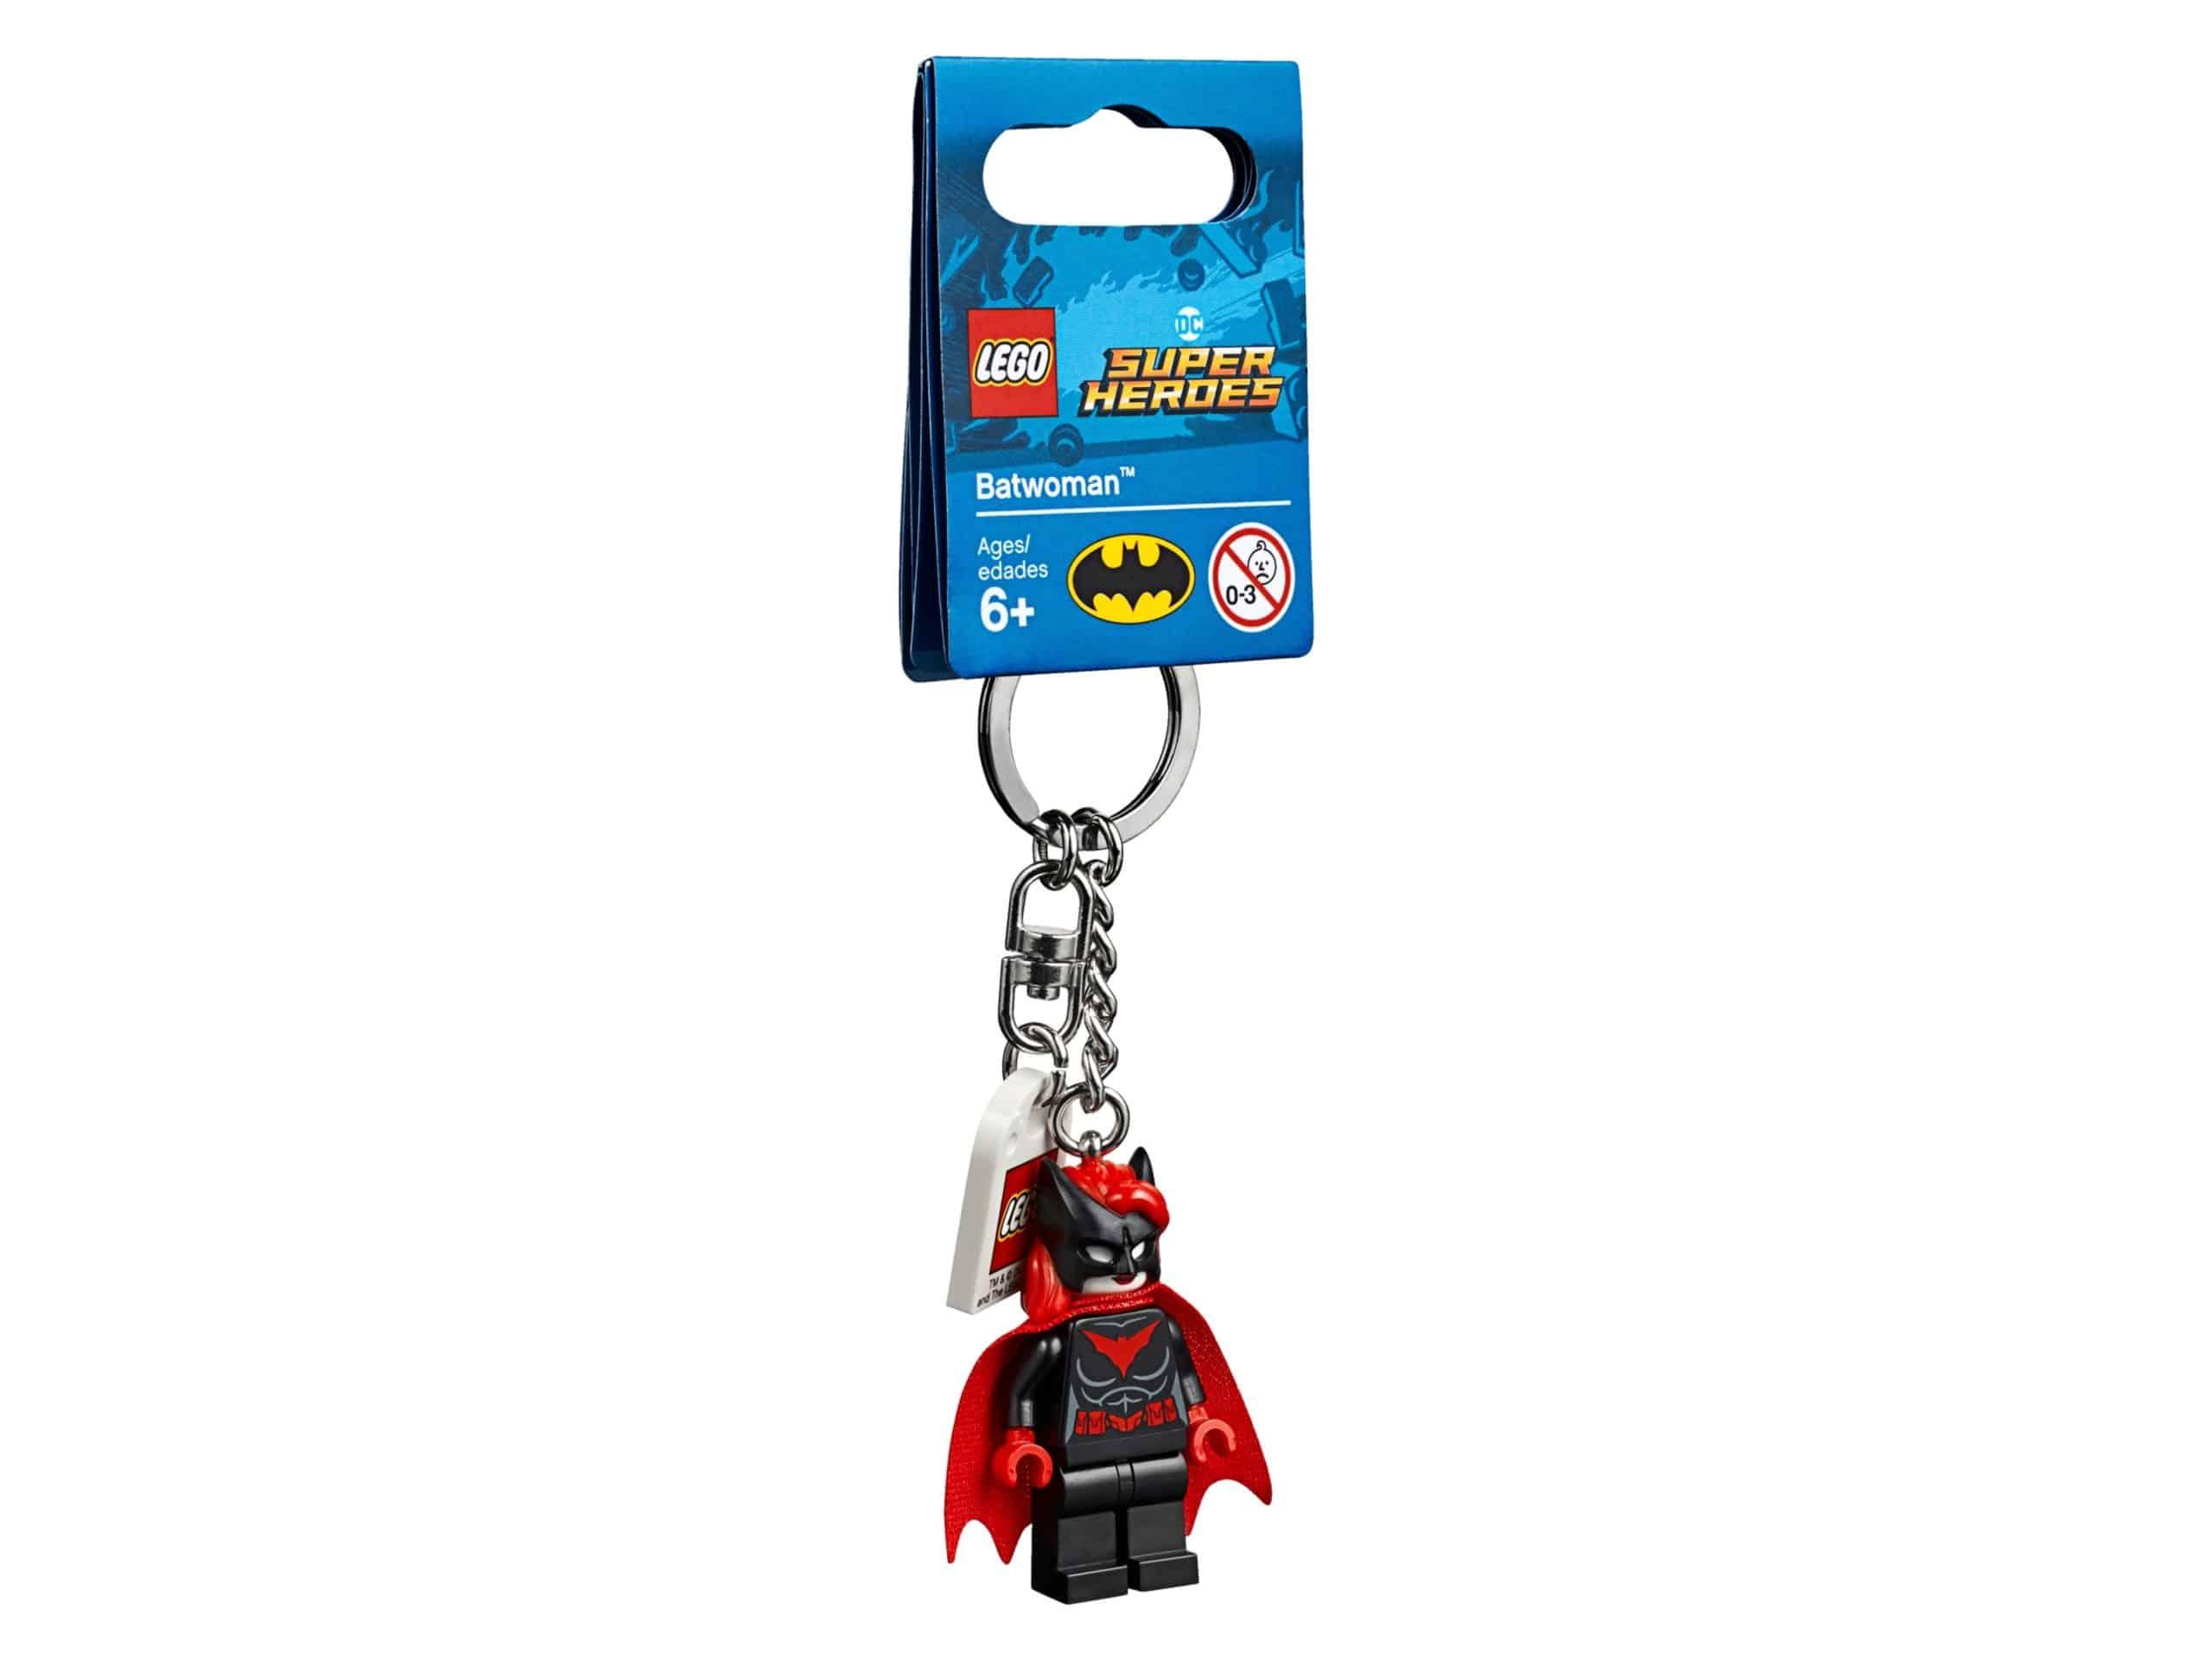 lego 853953 batwoman noglering scaled